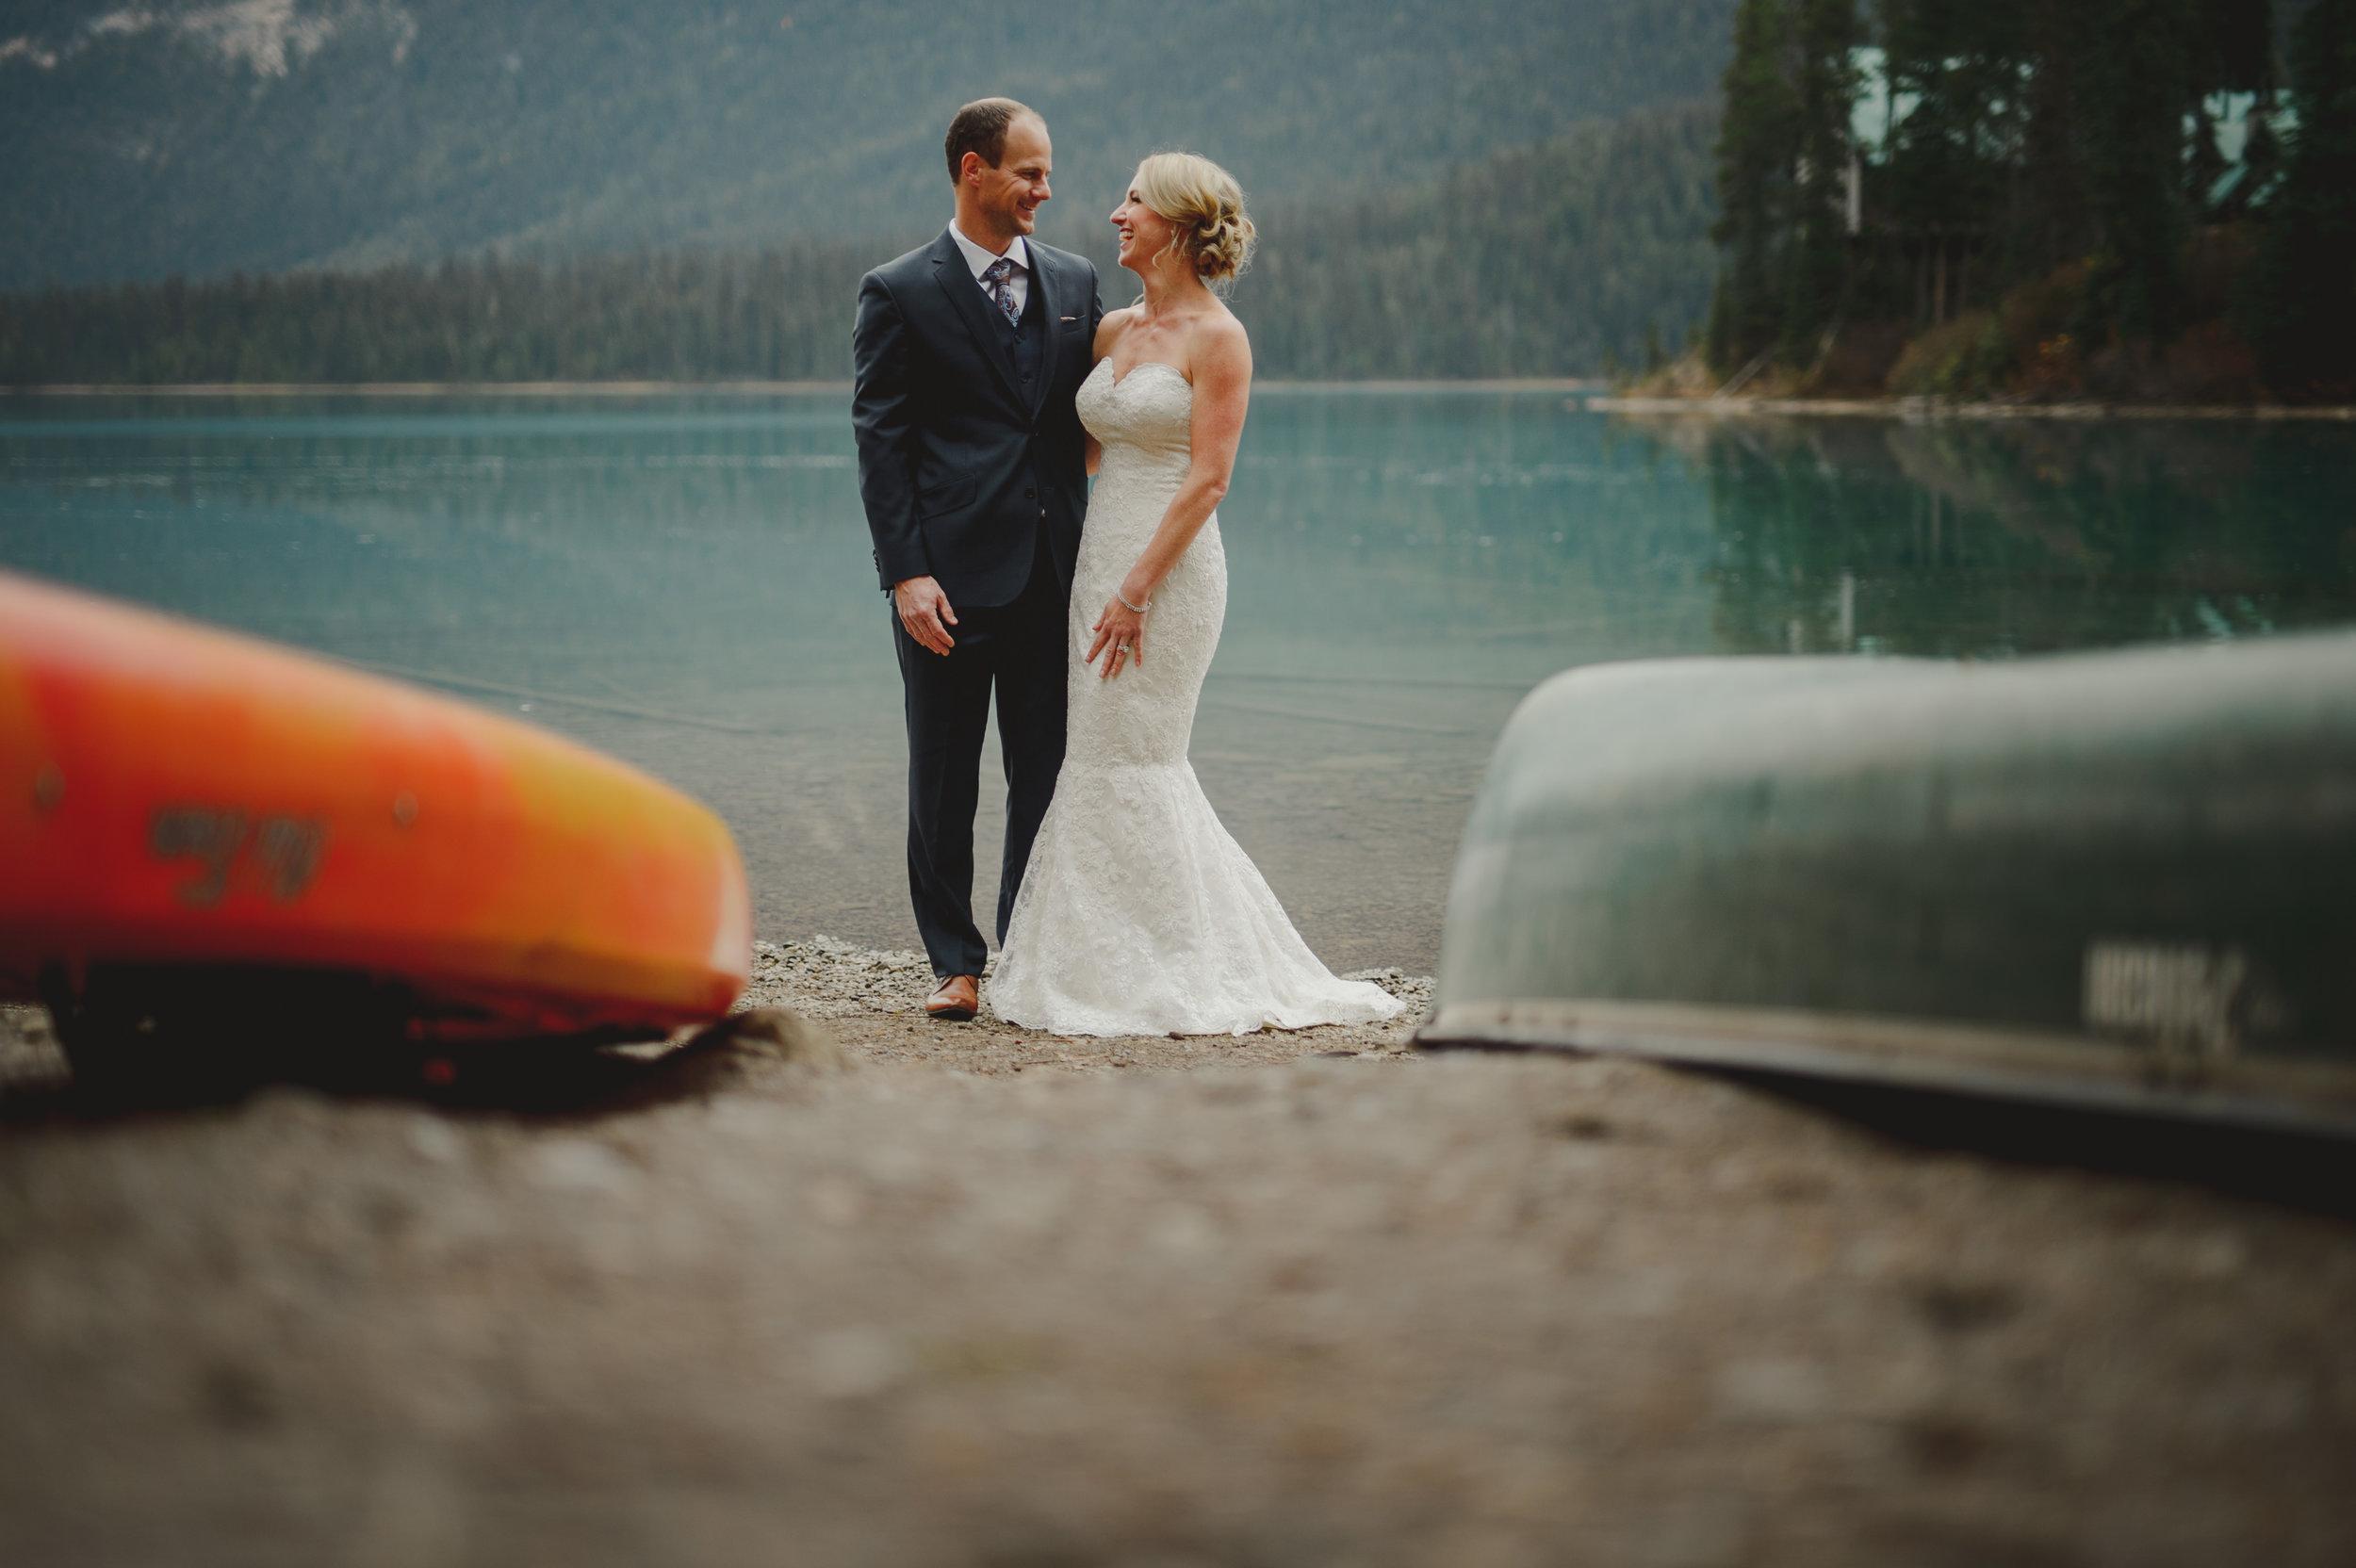 Banff-Wedding-Photographer-20.jpg